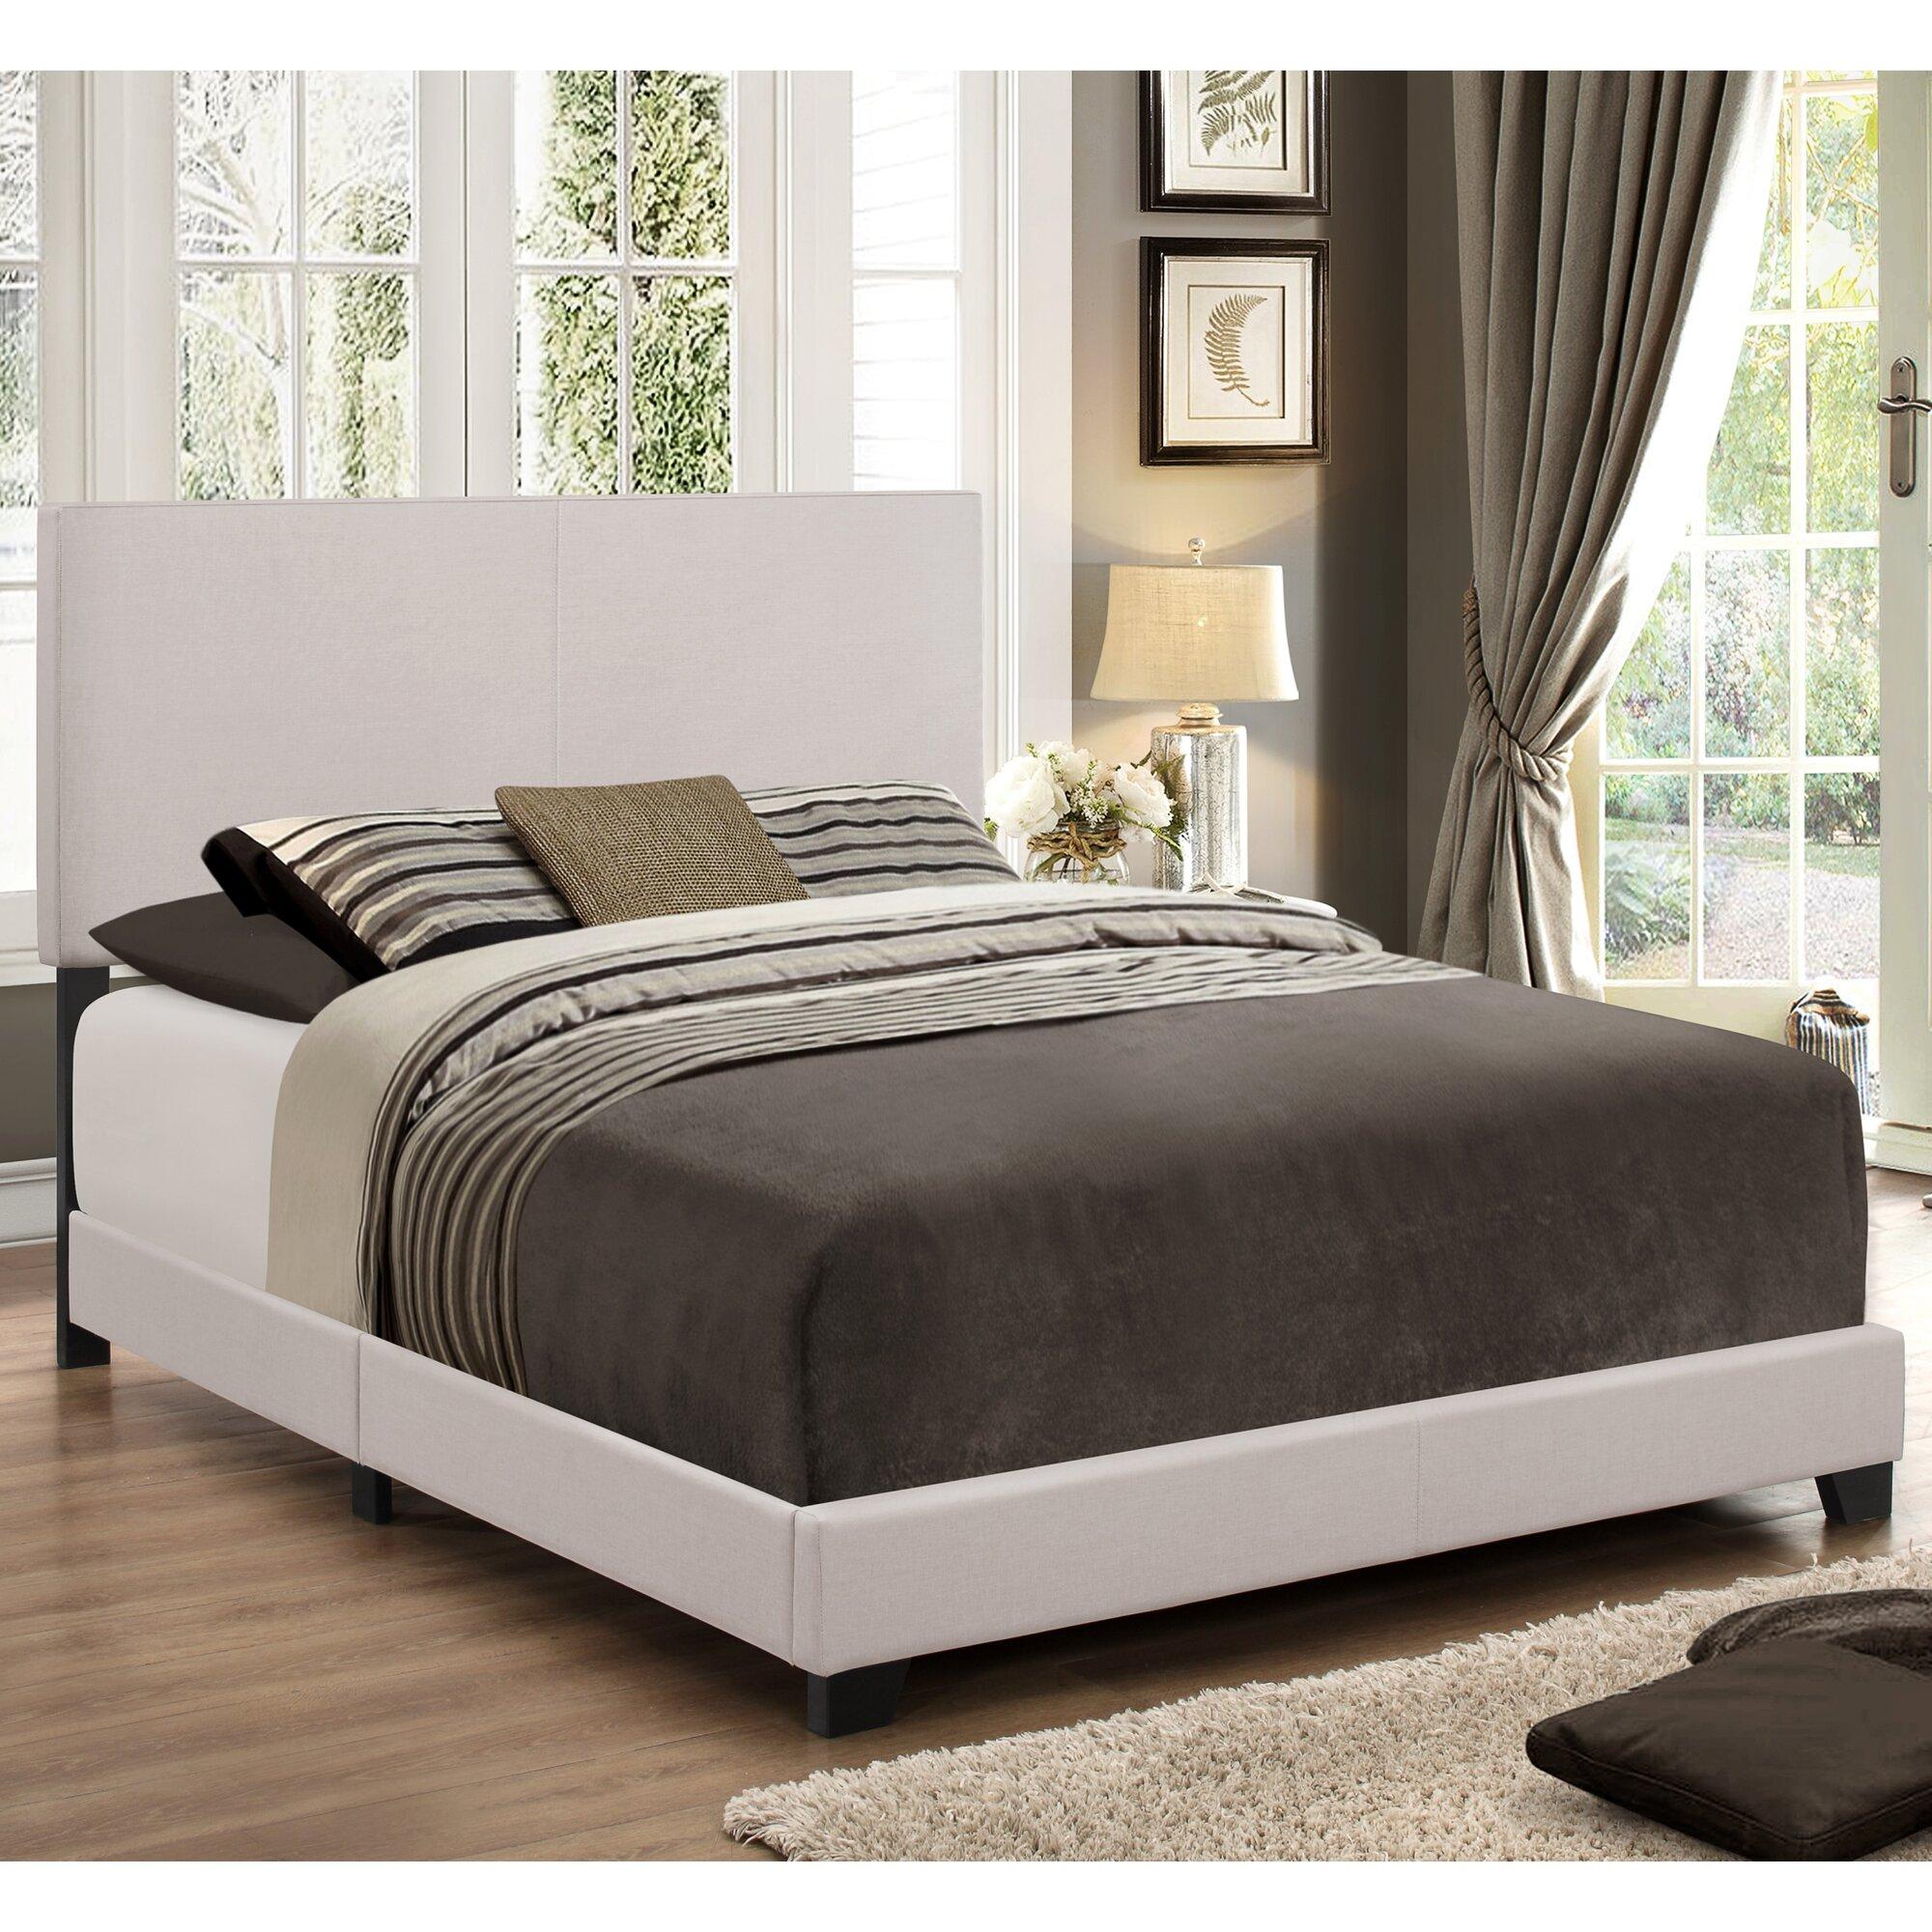 Wayfair All Modern: Zipcode Design Newport Upholstered Panel Bed & Reviews